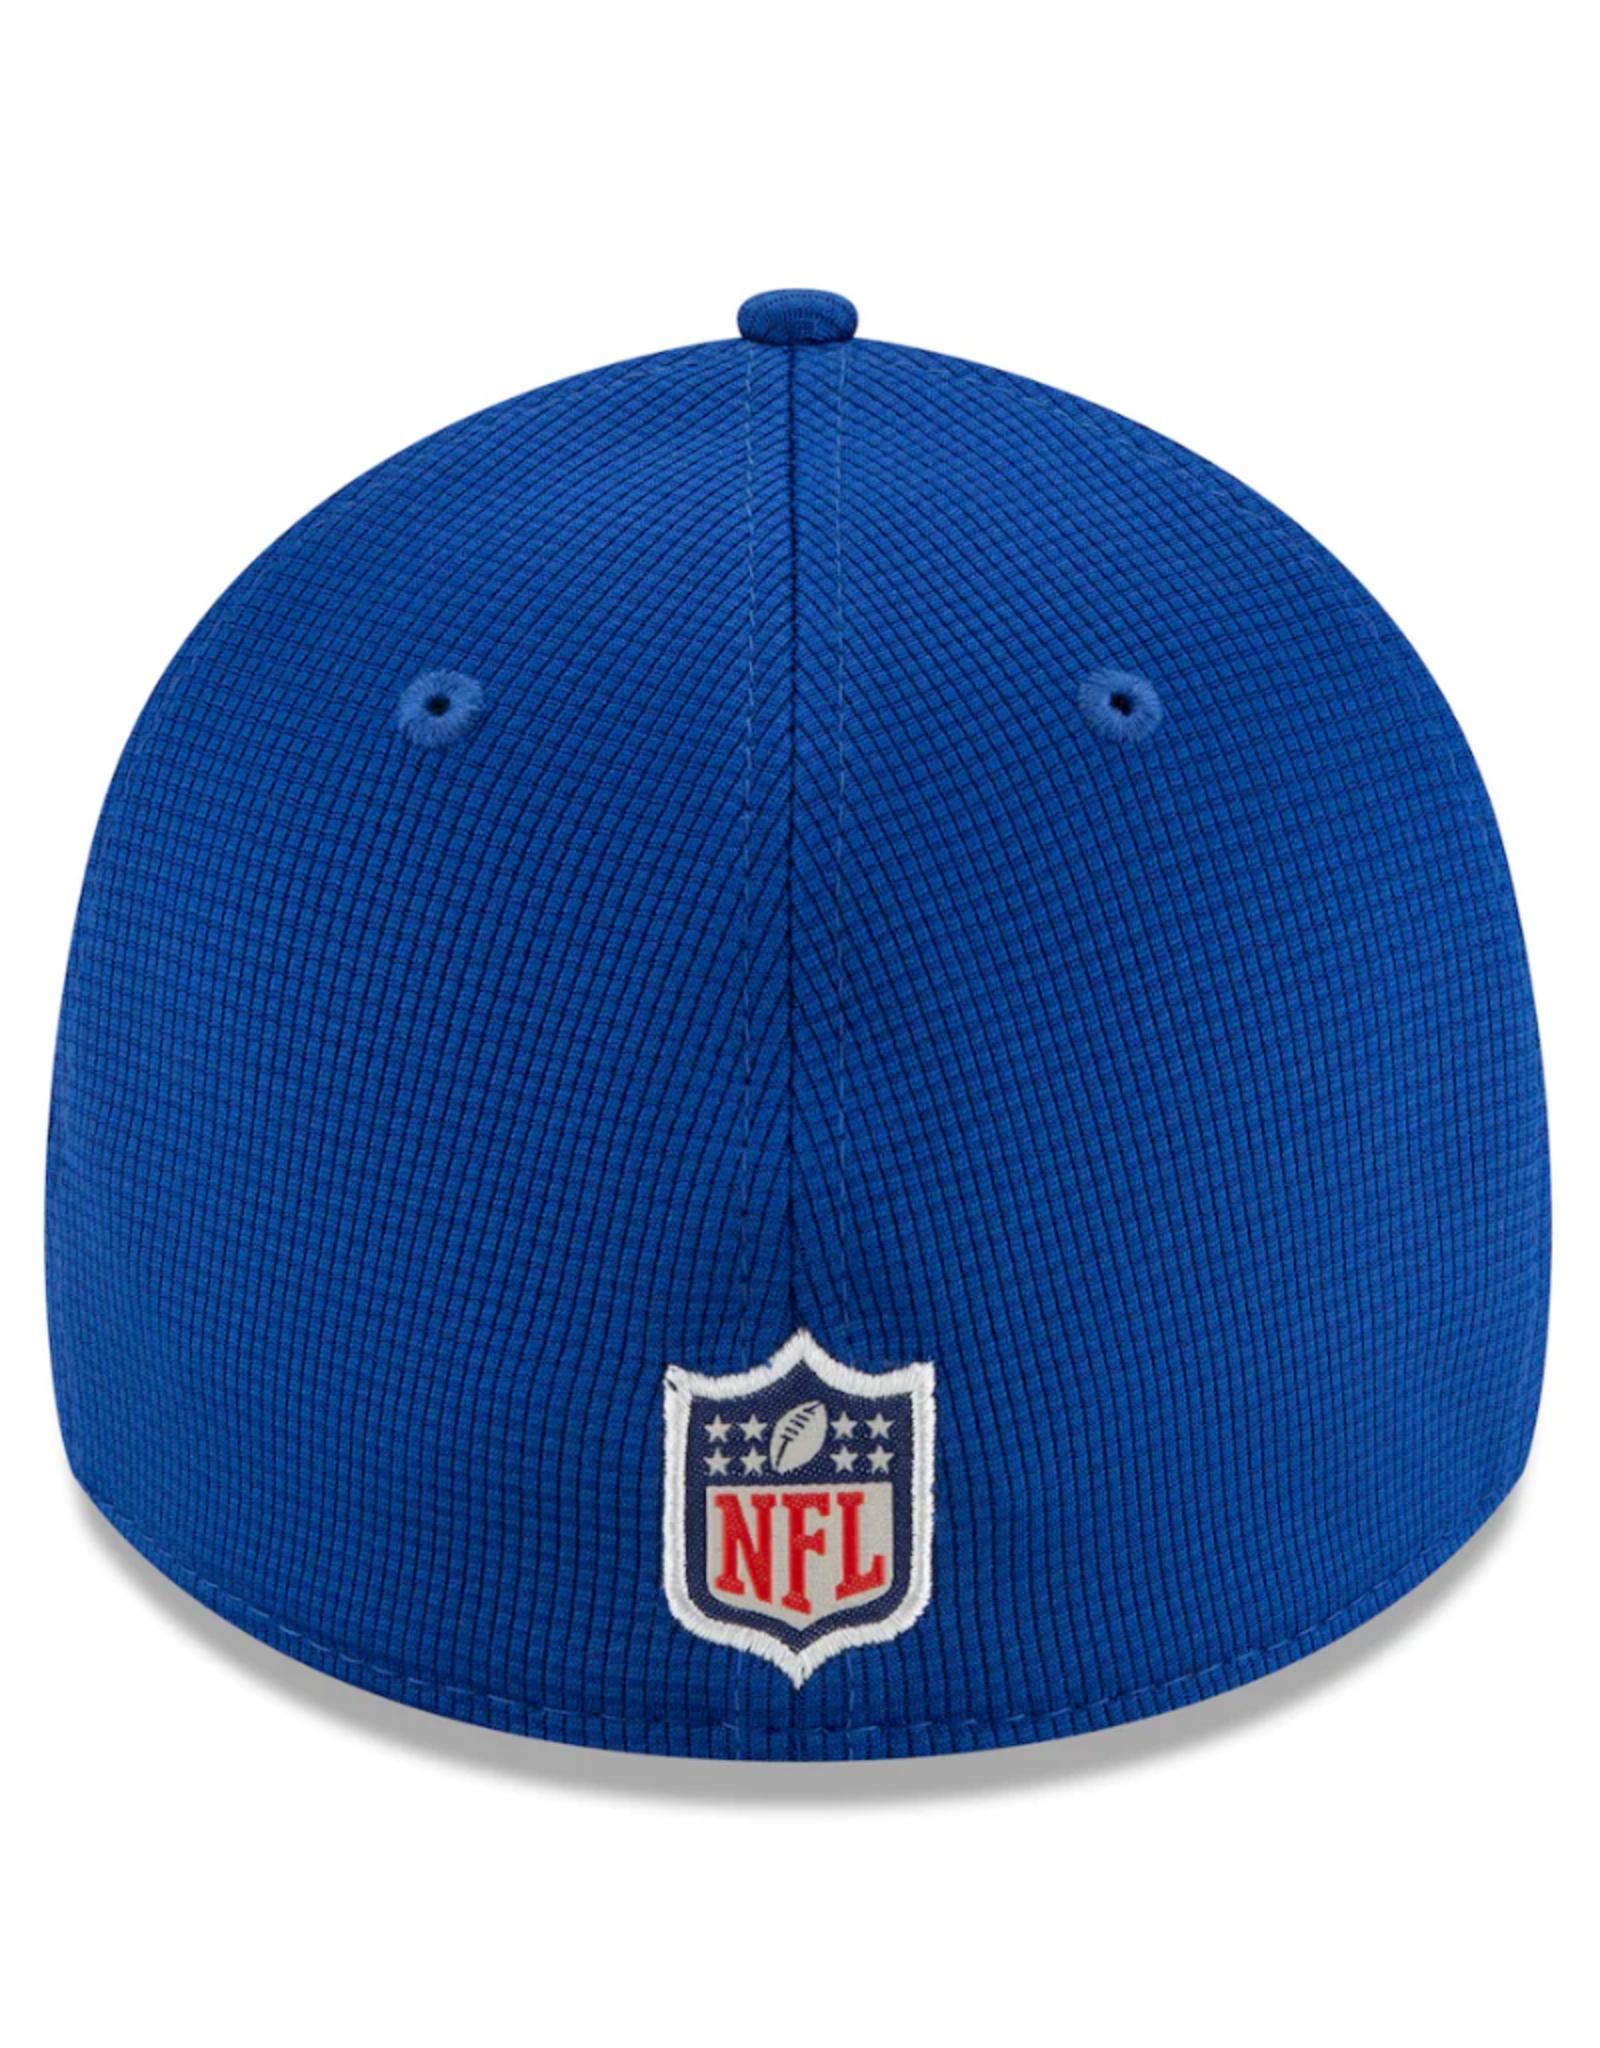 New Era Men's '21 39THIRTY Sideline Home Hat Los Angeles Rams Blue